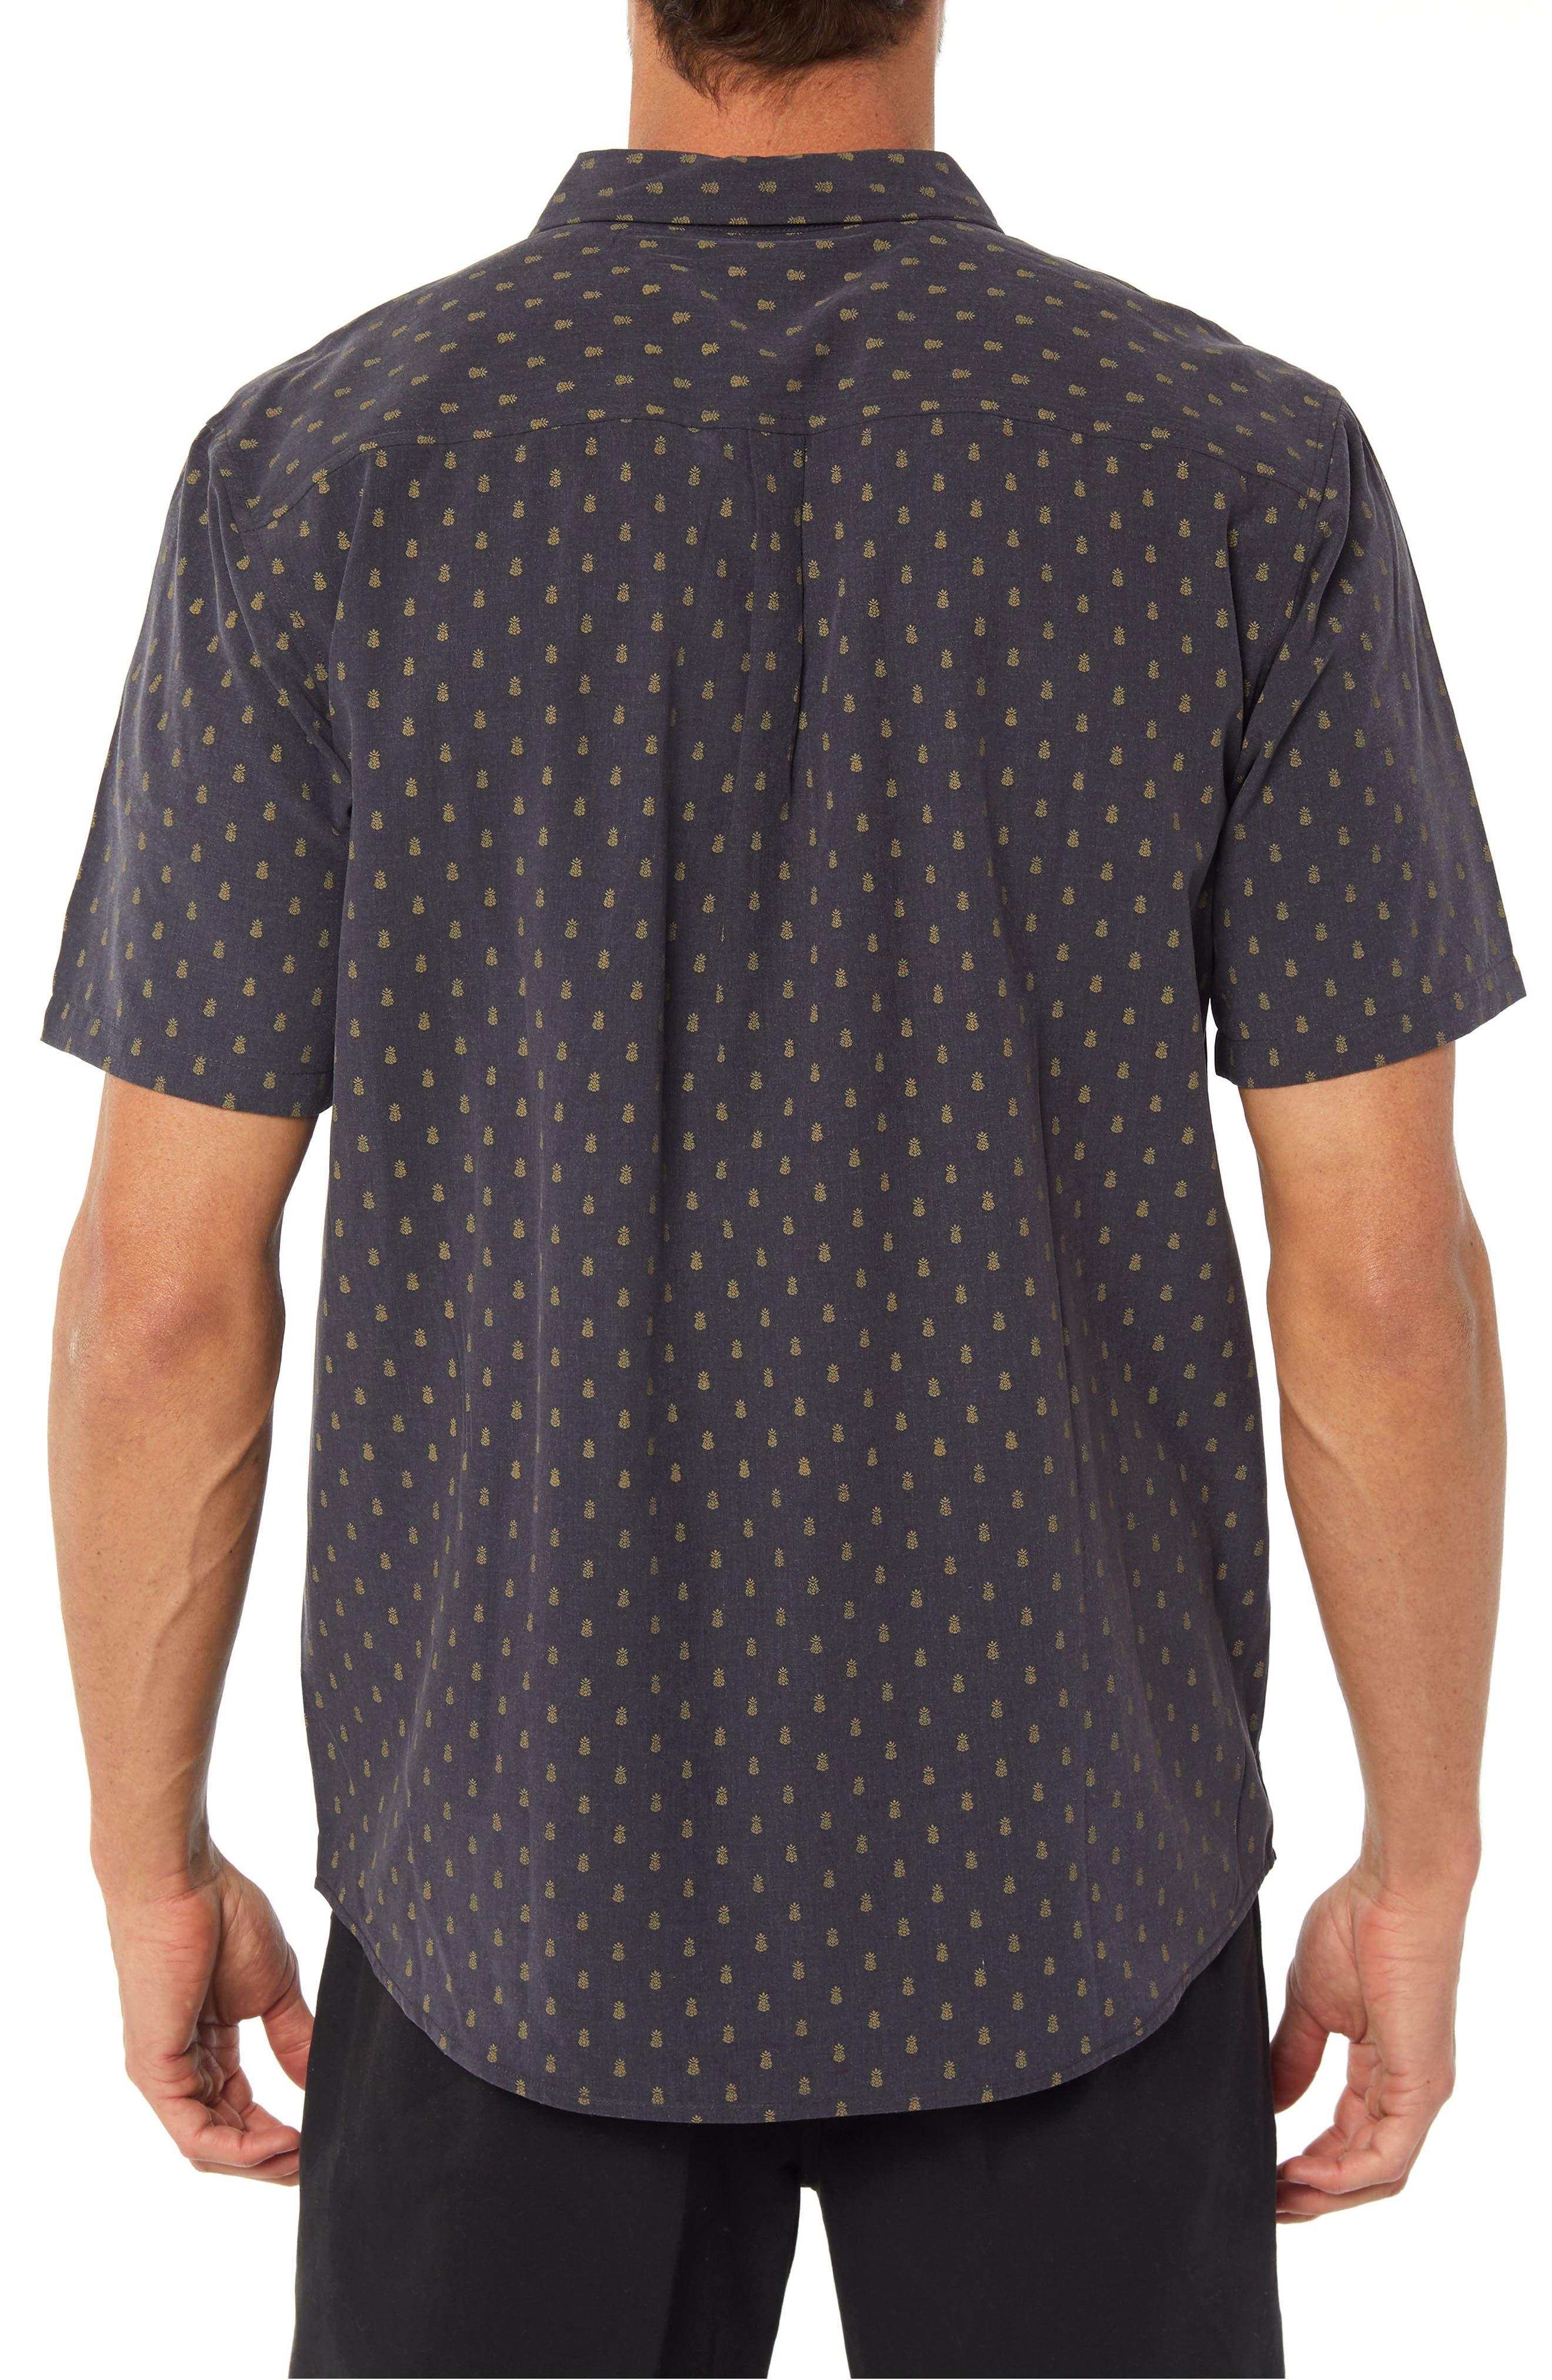 Home Grown Pineapple Sport Shirt,                             Alternate thumbnail 2, color,                             268